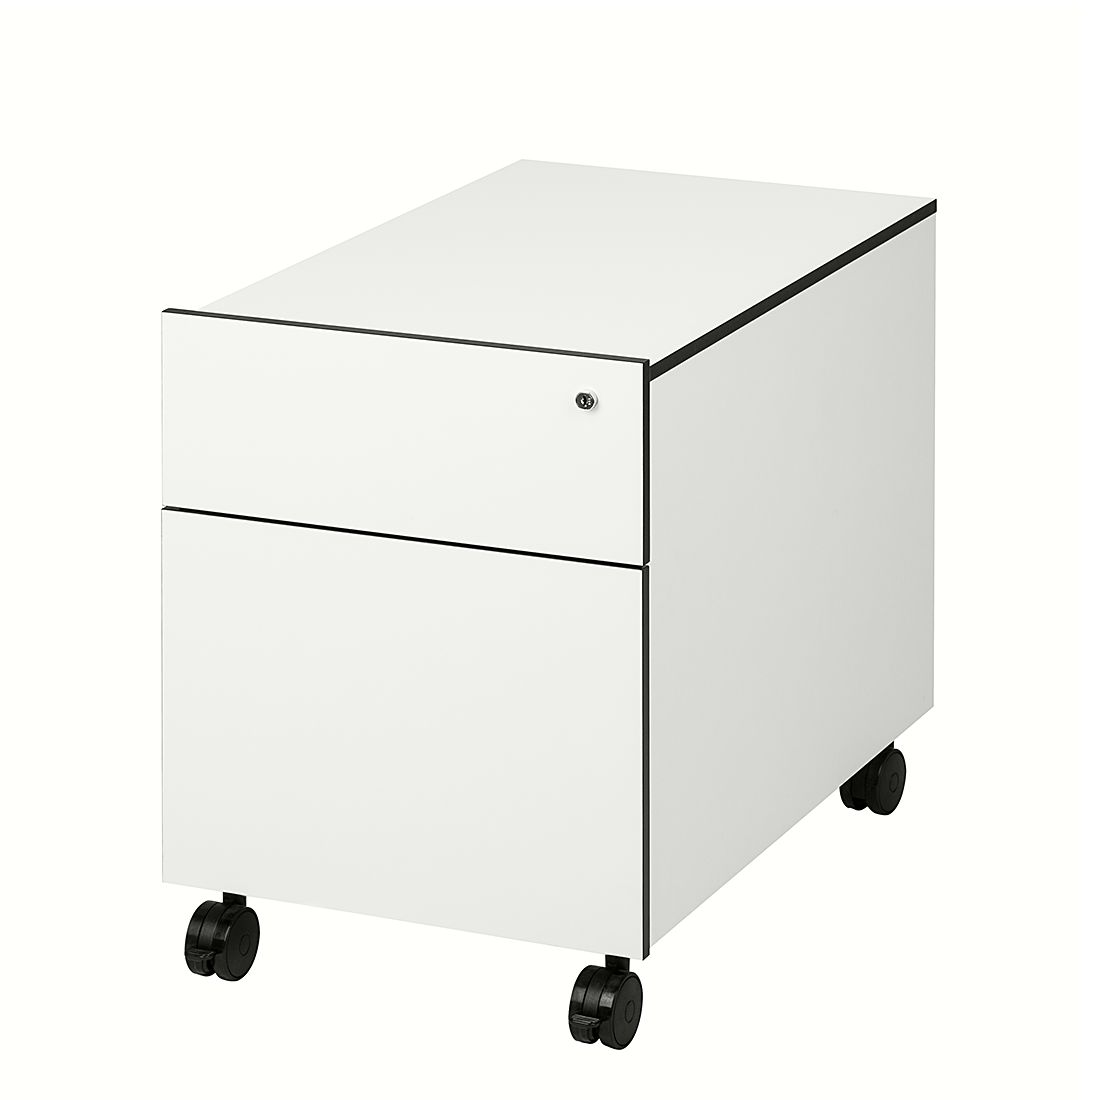 rollcontainer archive seite 2 von 5. Black Bedroom Furniture Sets. Home Design Ideas